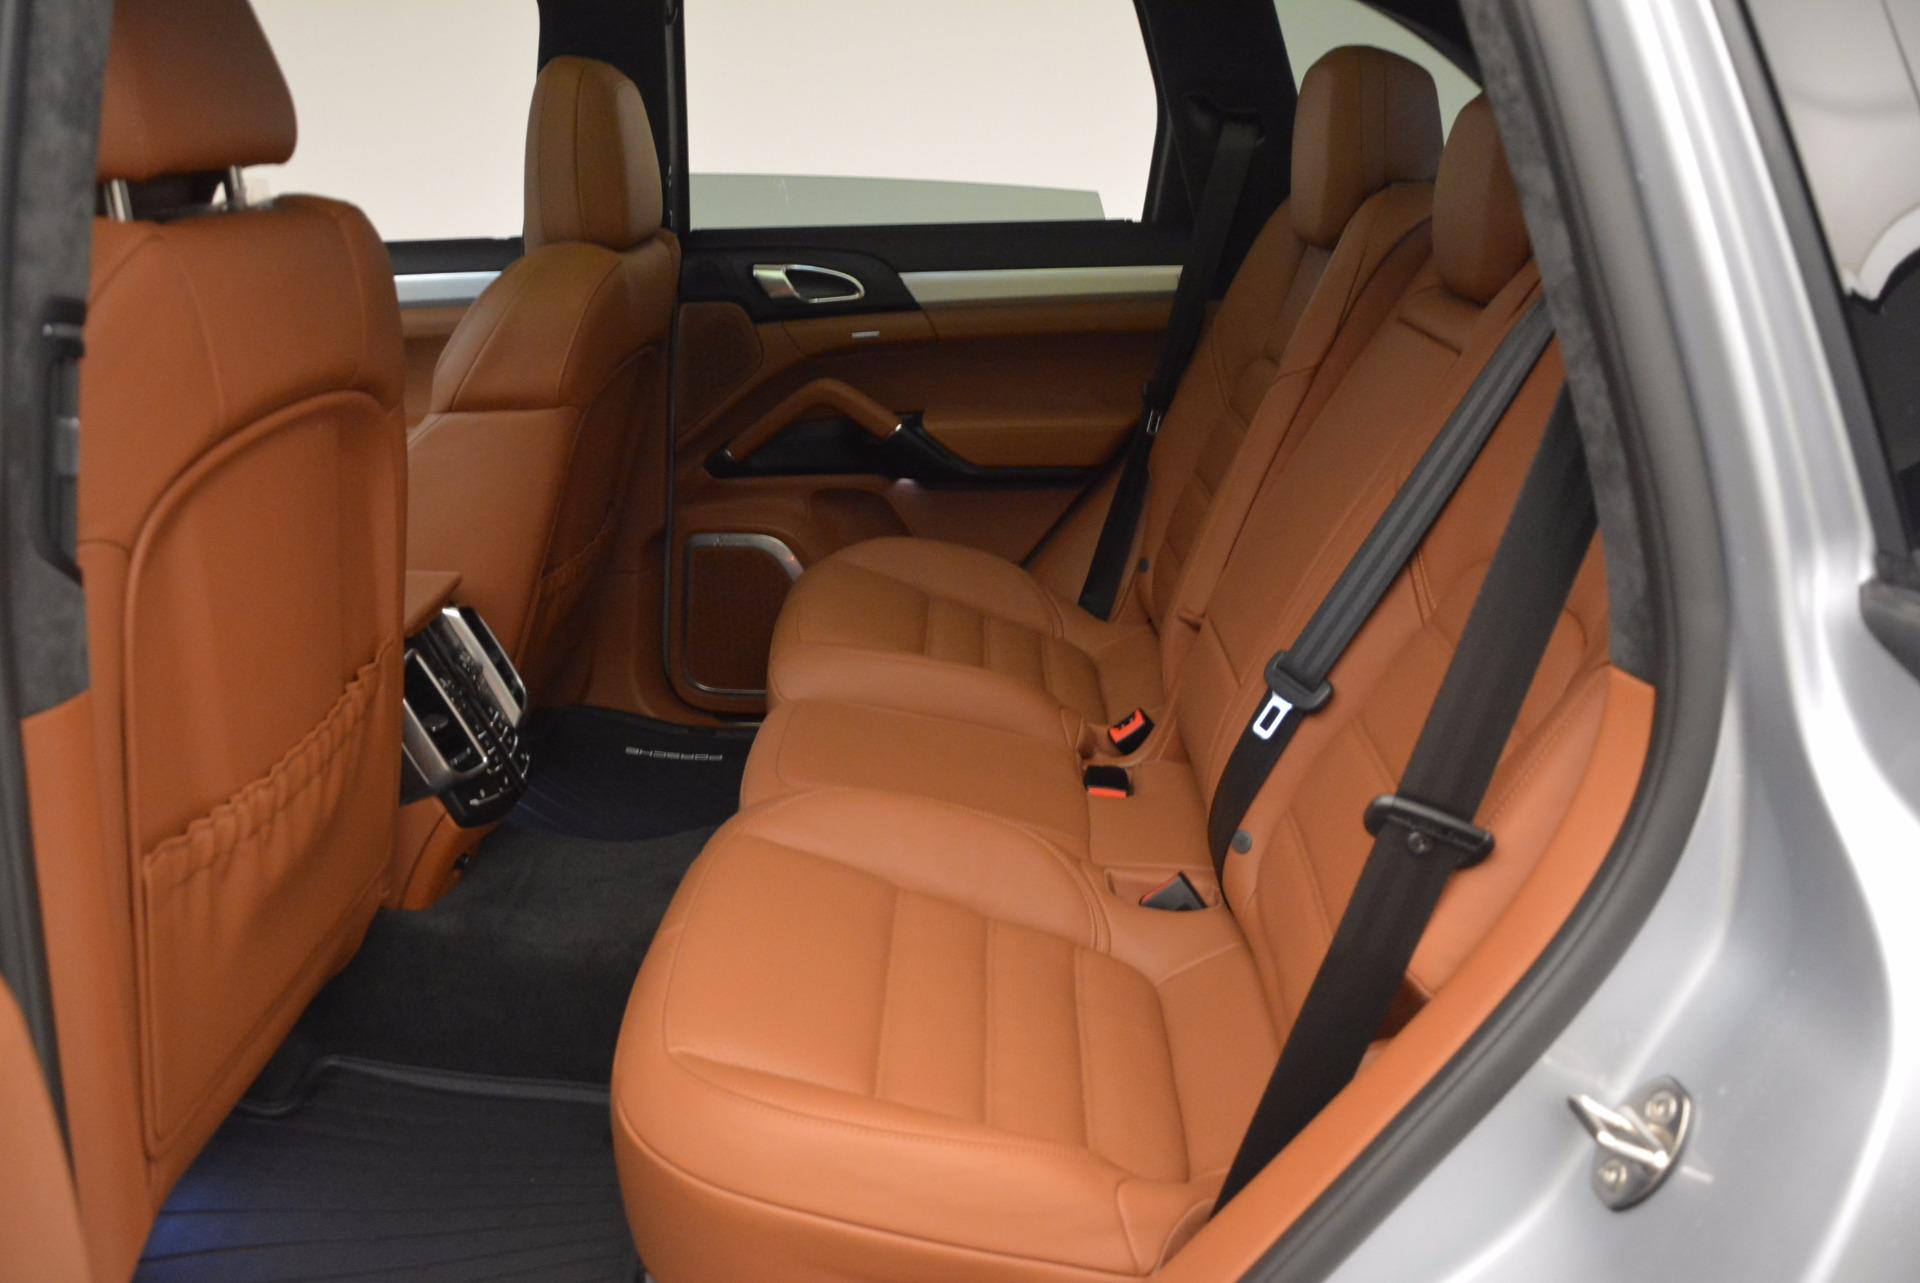 Used 2016 Porsche Cayenne Turbo For Sale In Greenwich, CT. Alfa Romeo of Greenwich, 7165 1000_p26